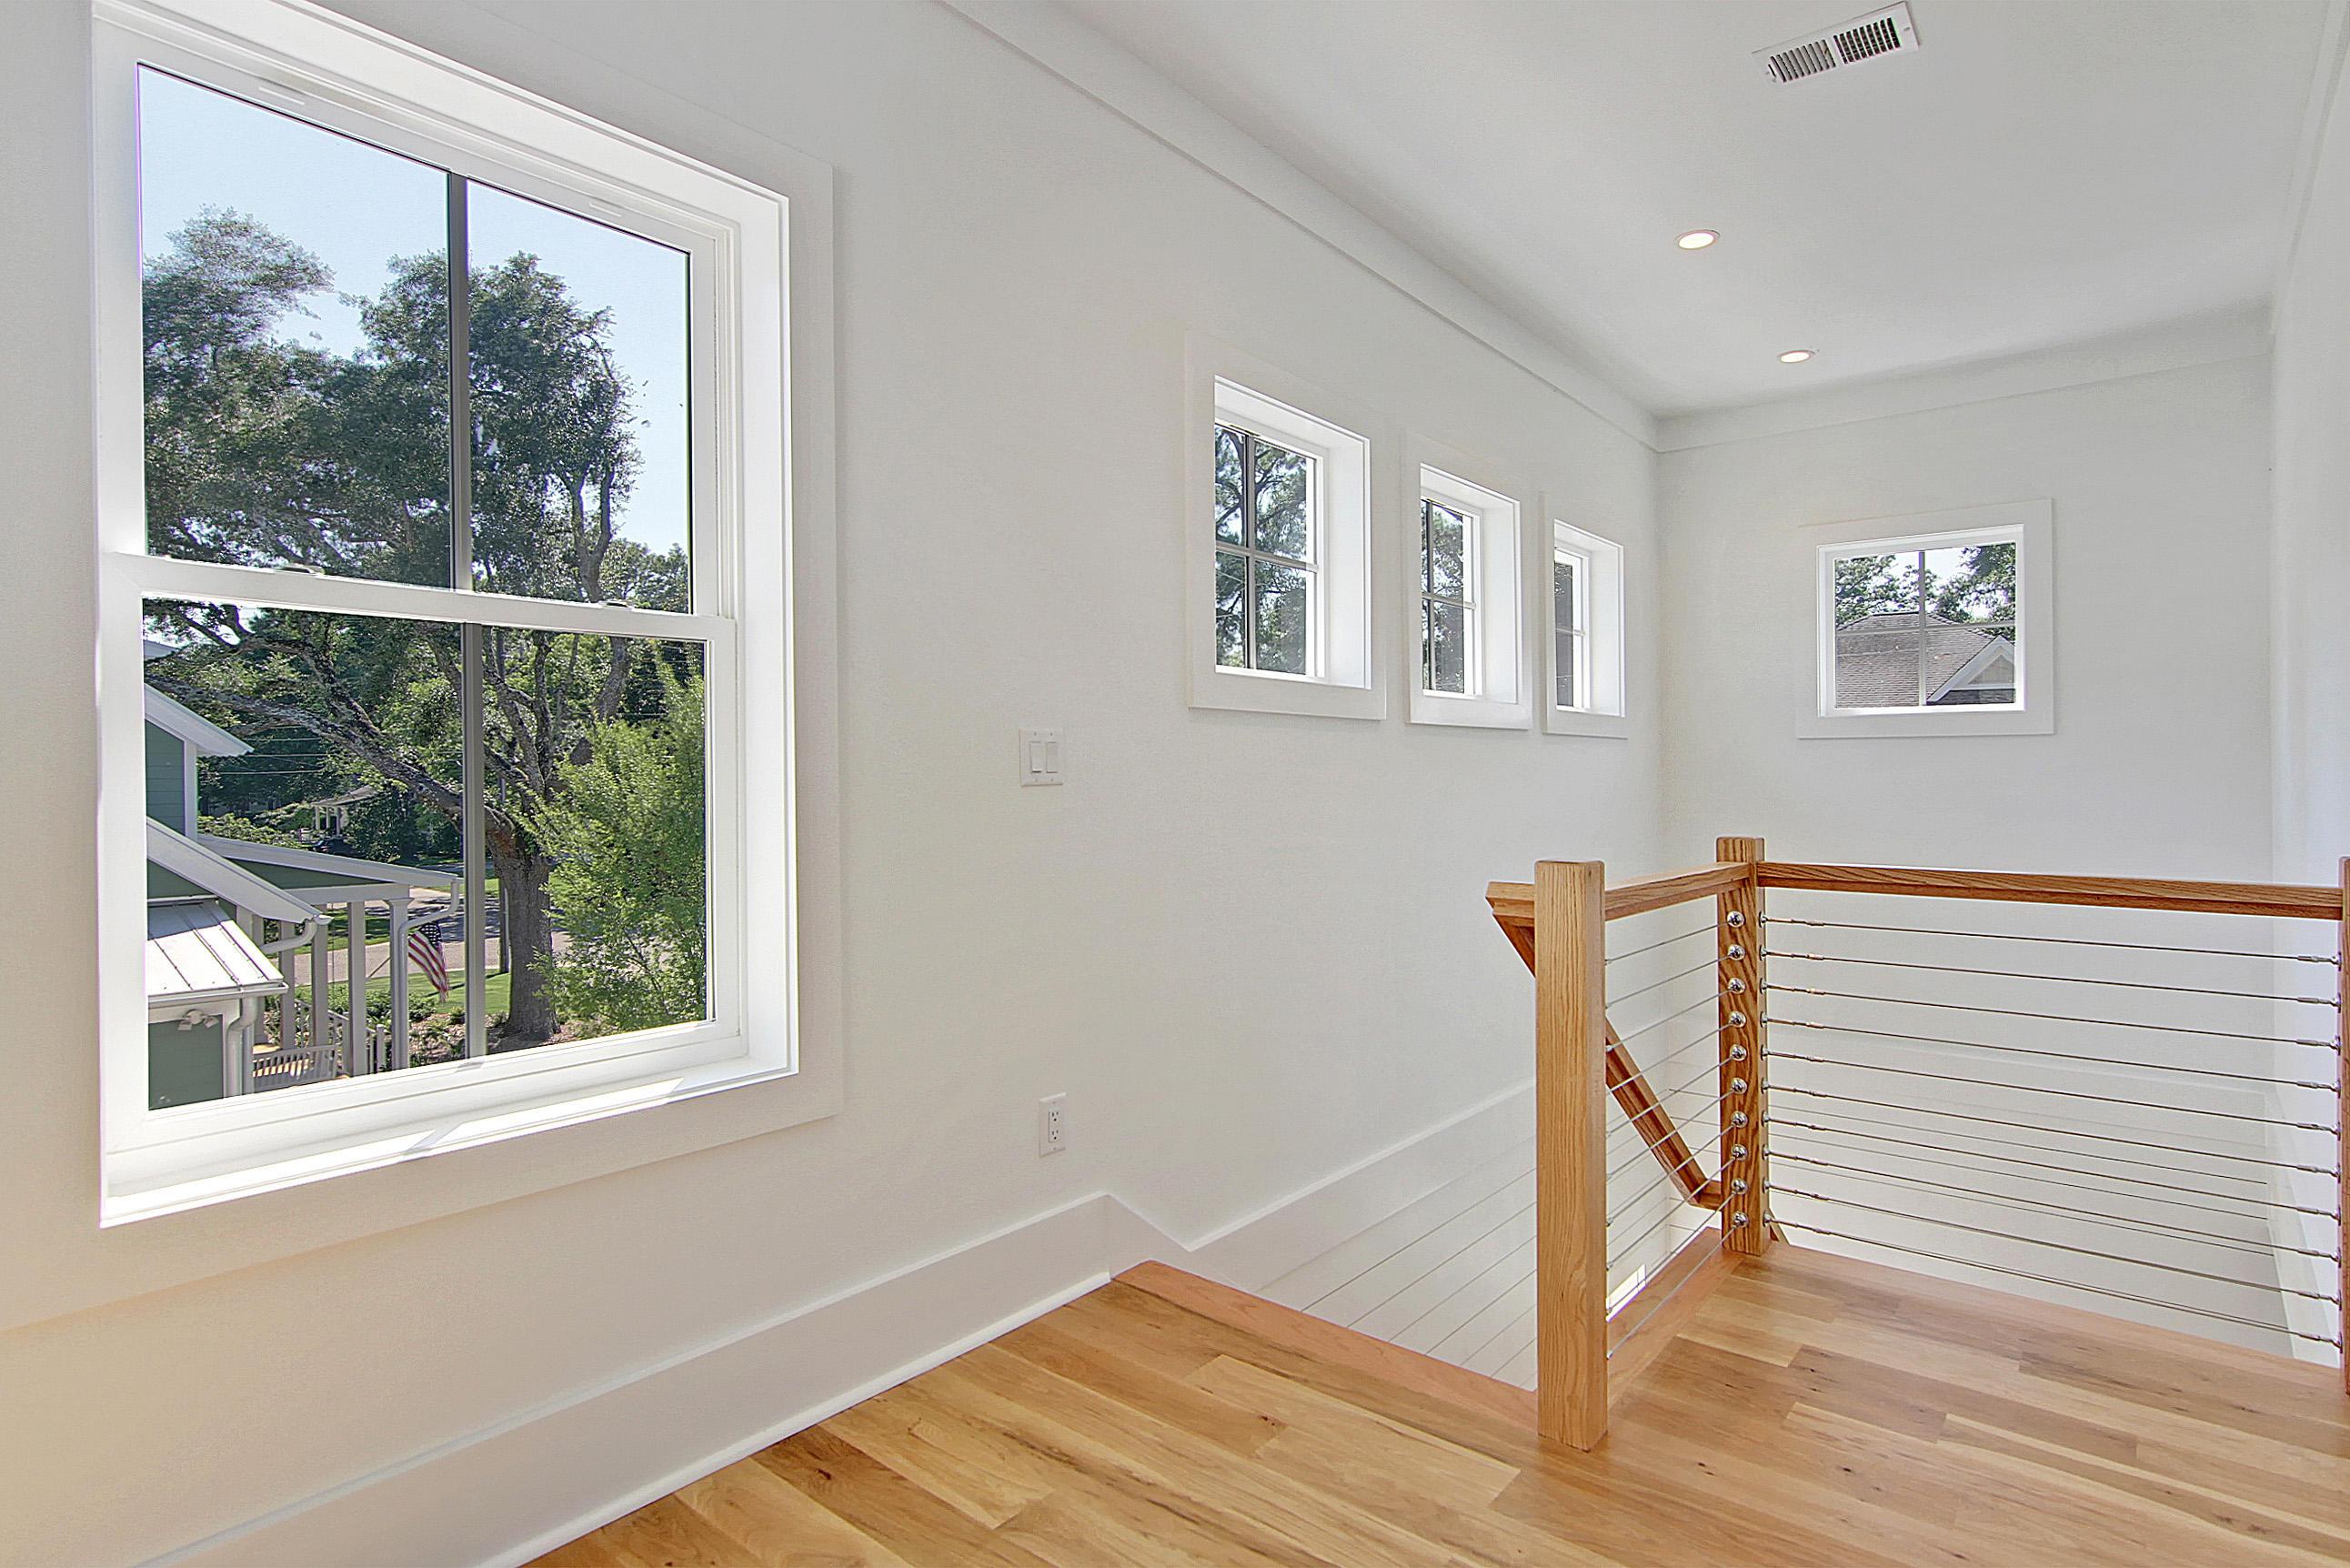 Old Mt Pleasant Homes For Sale - 733 Atlantic, Mount Pleasant, SC - 28